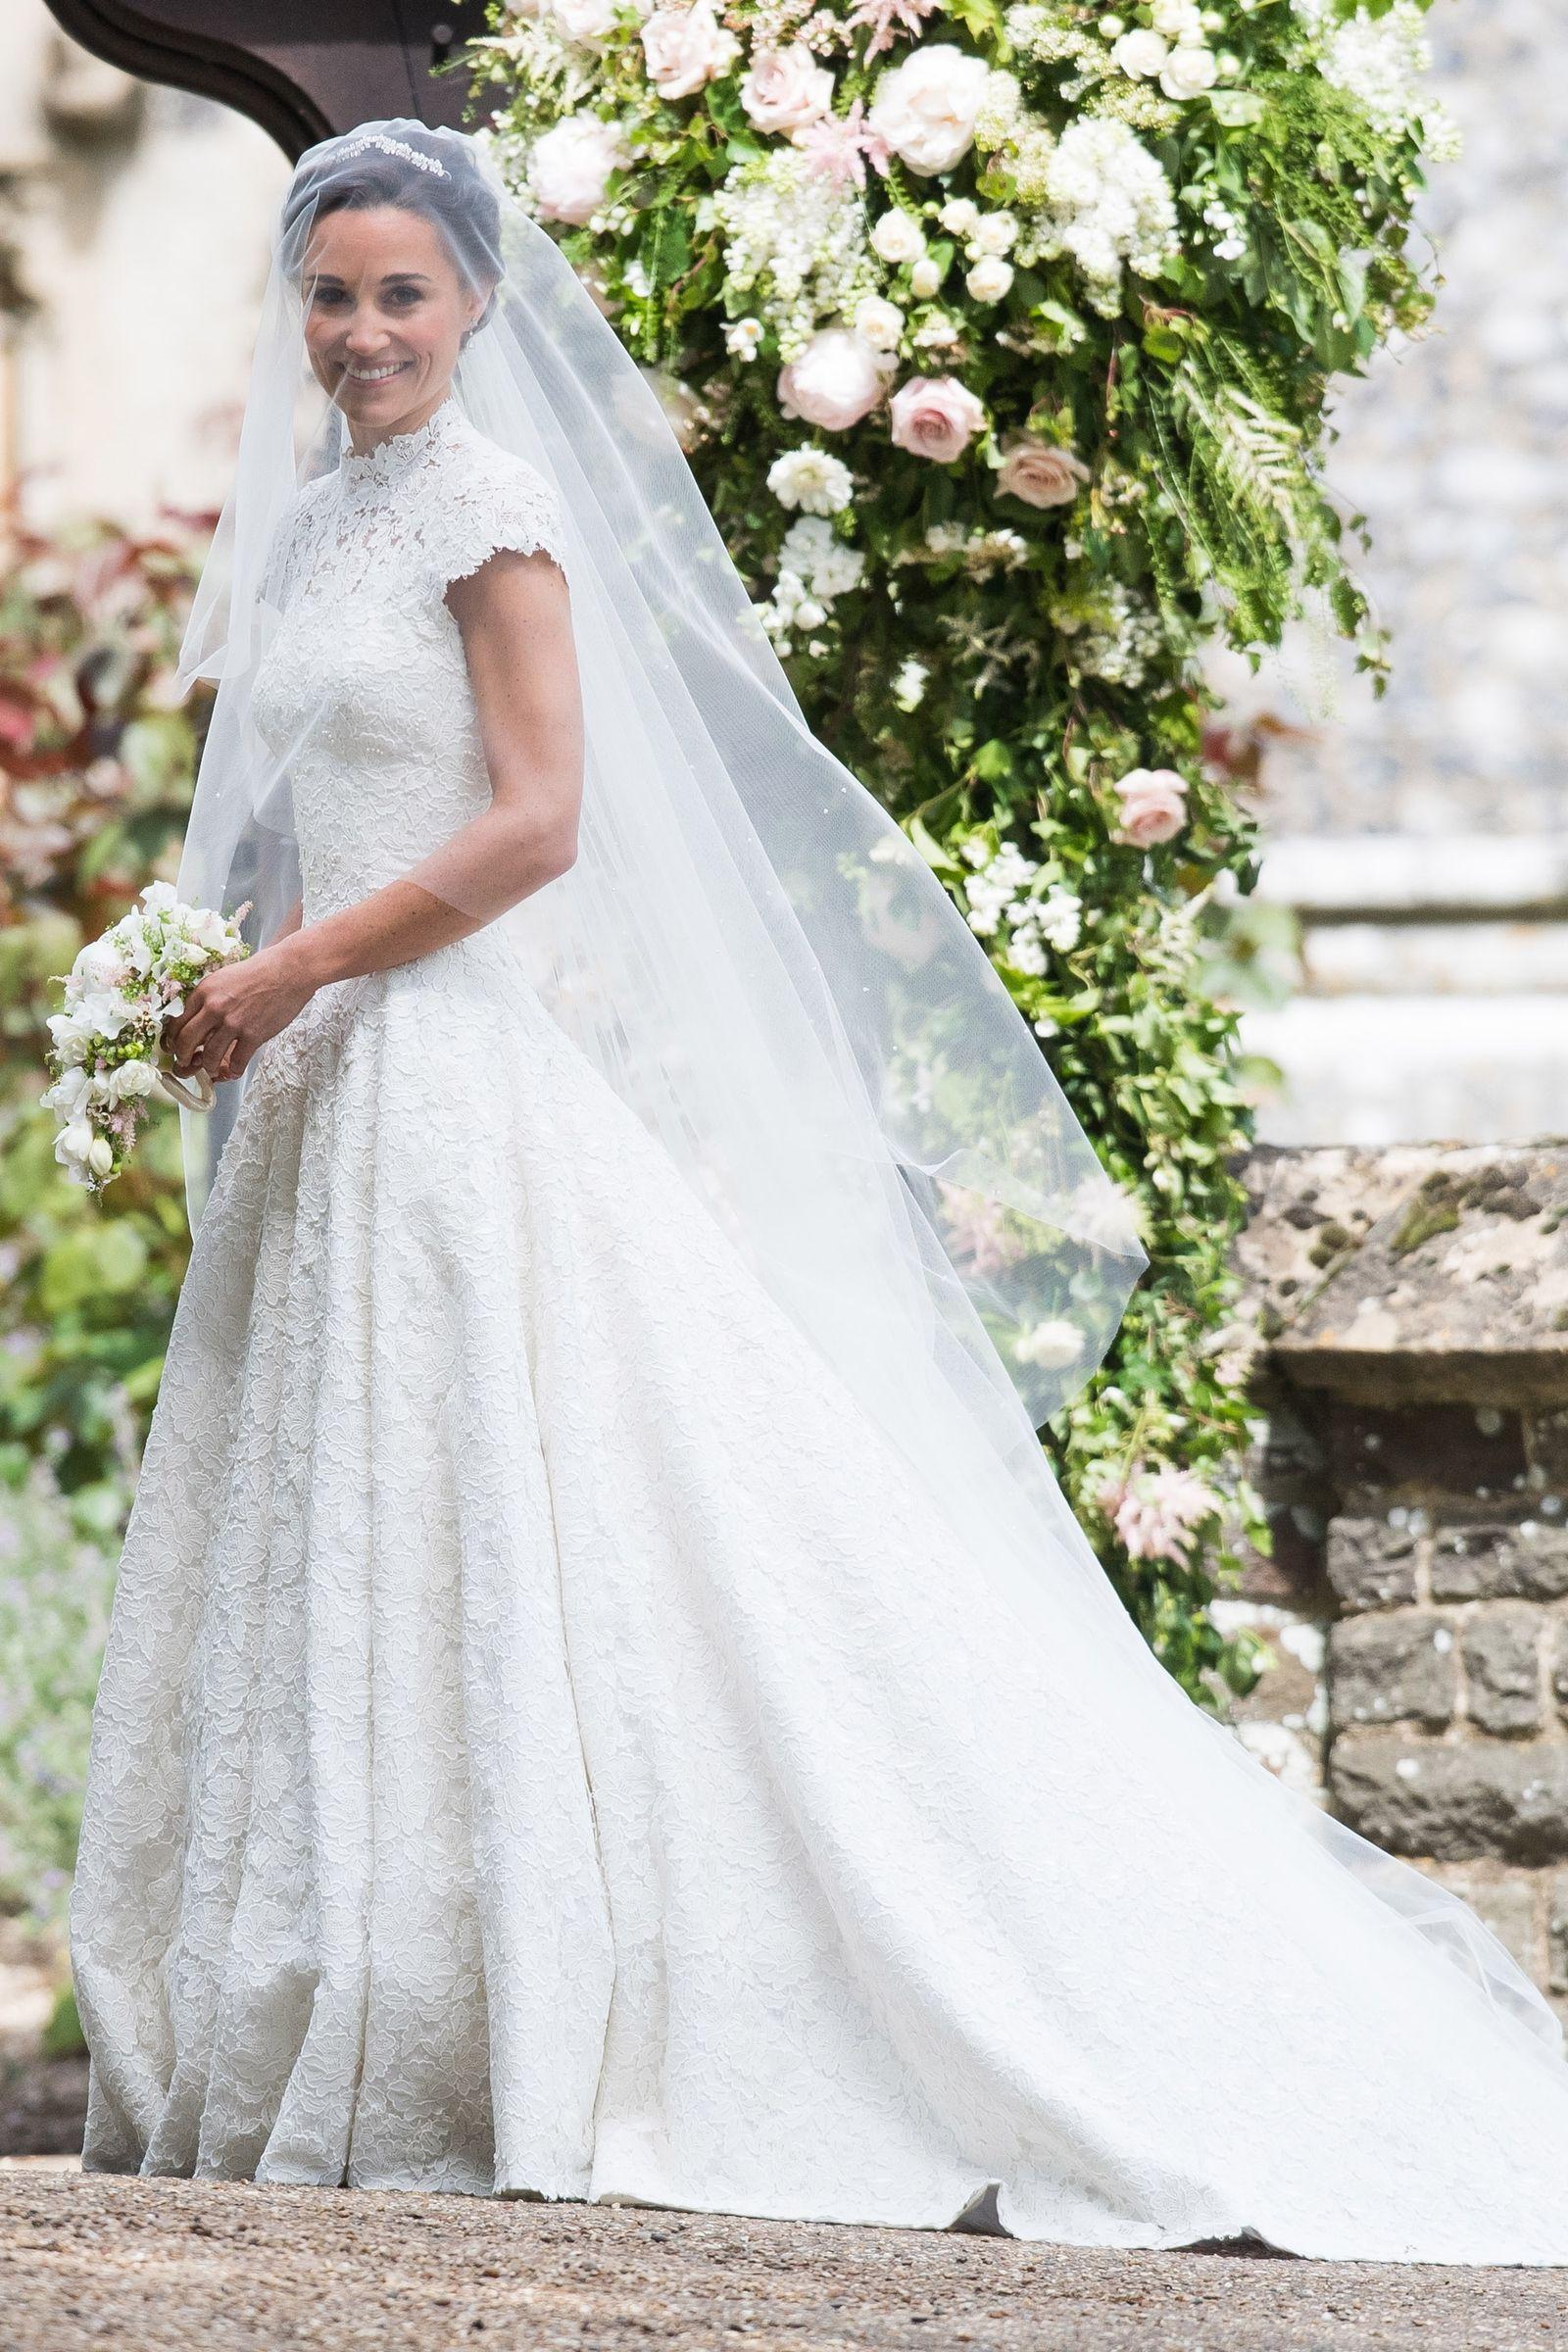 The 50 Most Iconic Wedding Gowns In History | Königlicher stil ...